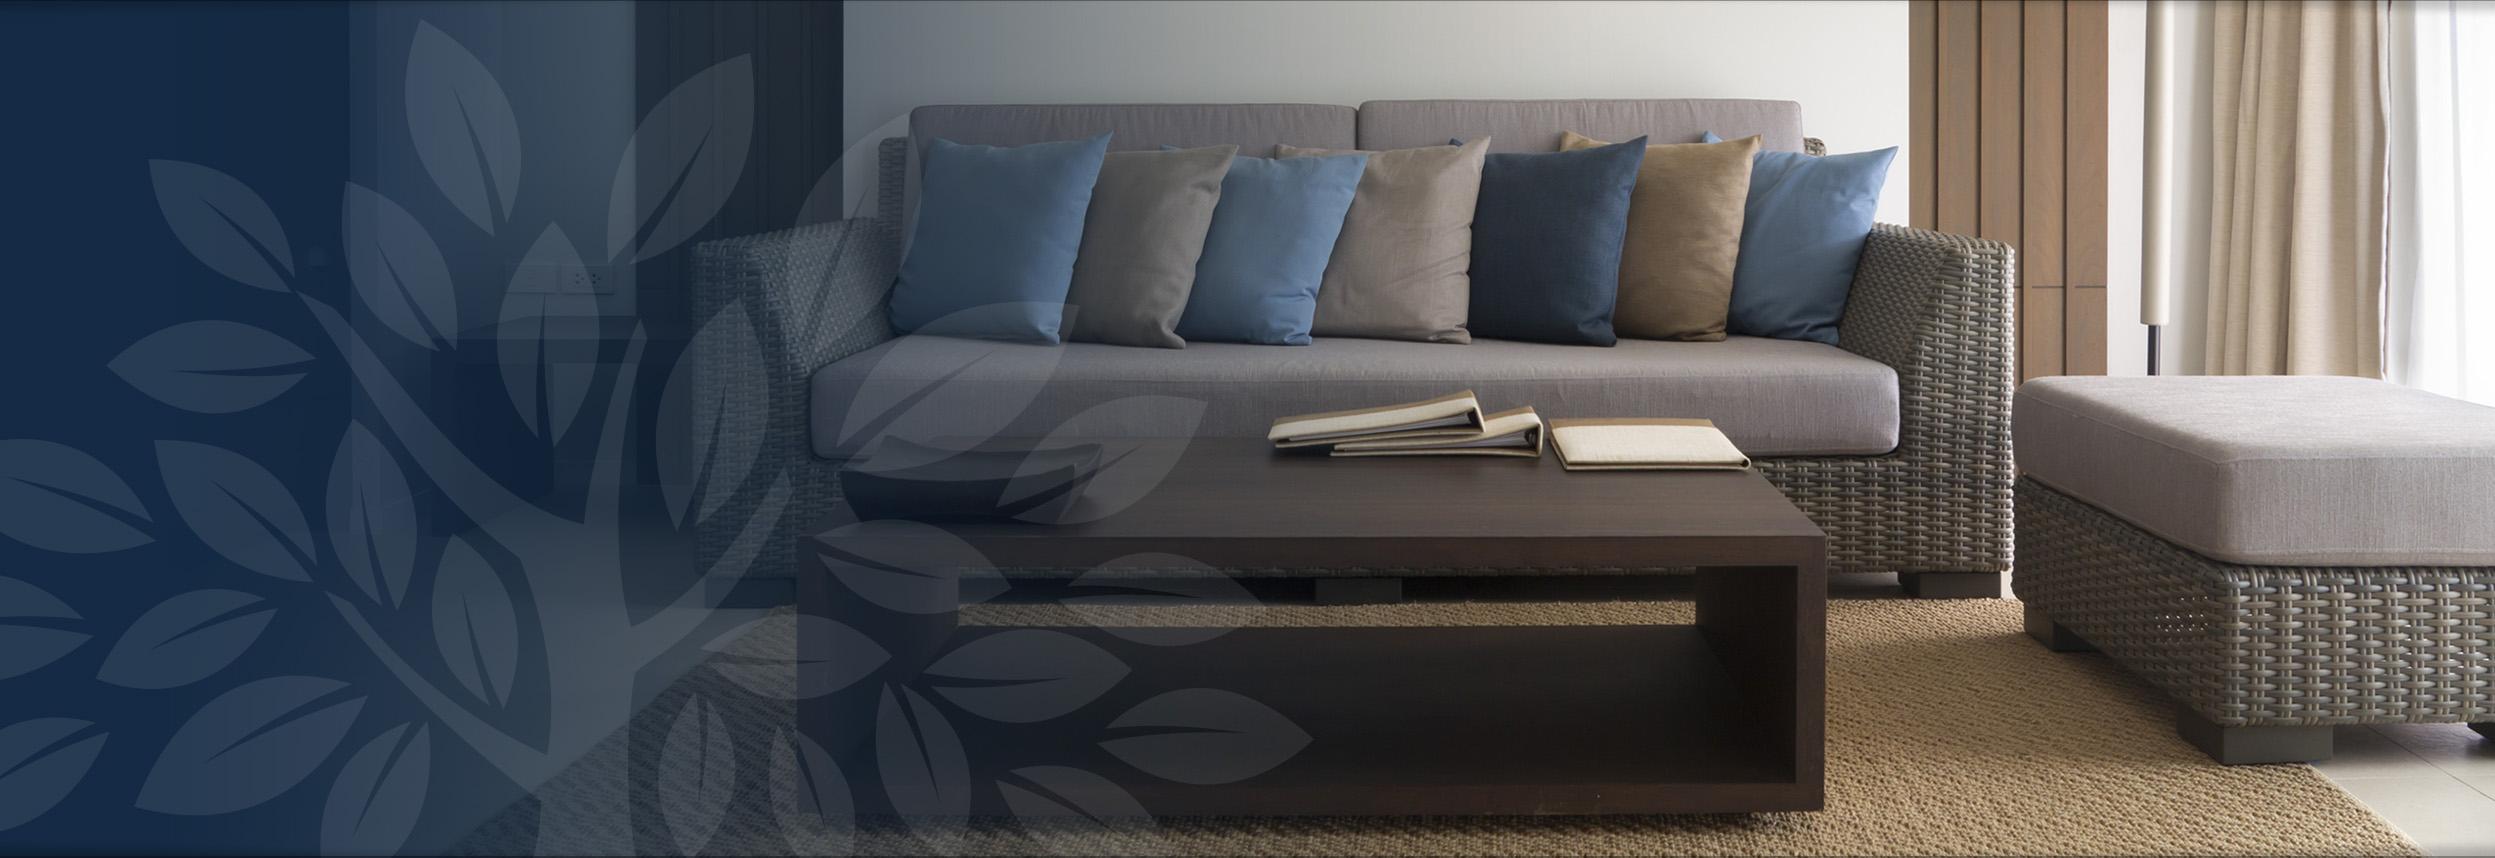 Furniture Suppliers West Creek Financial Richmond VA